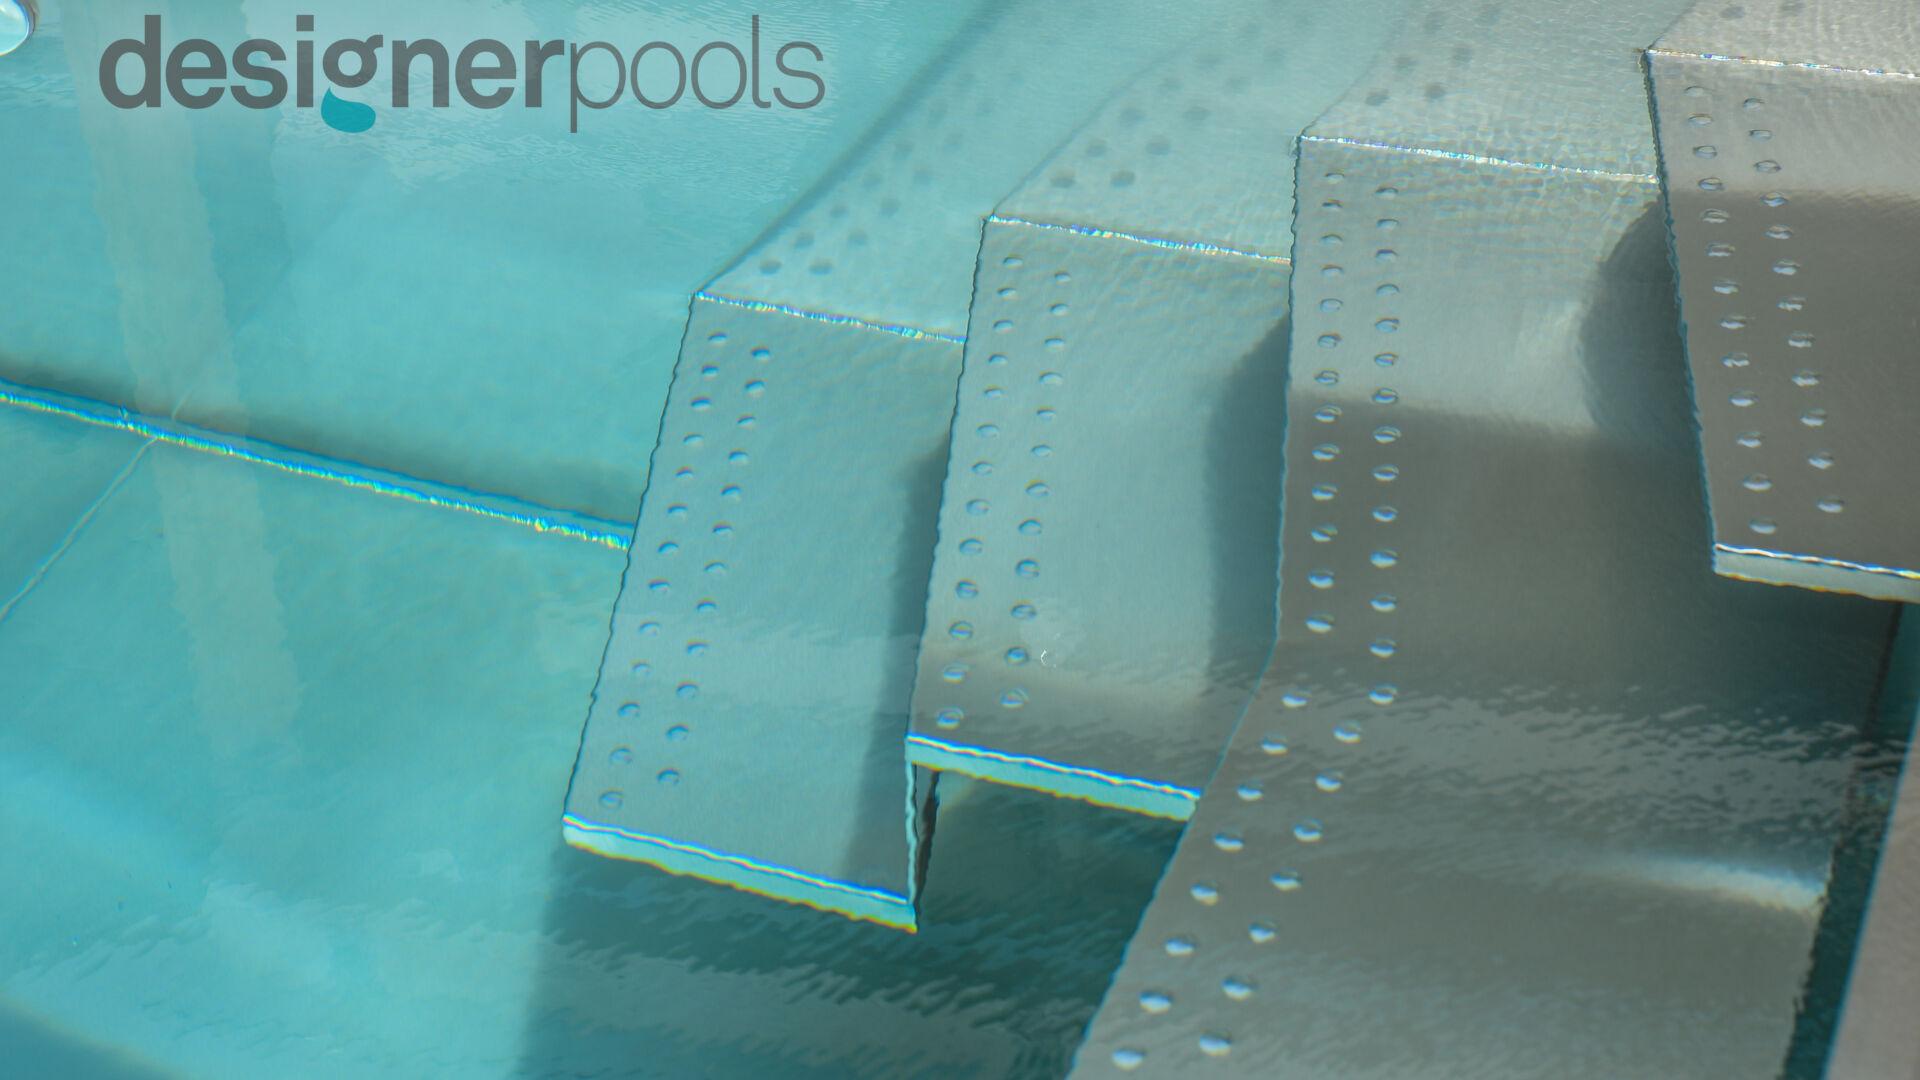 Inox-Pools - designerpools